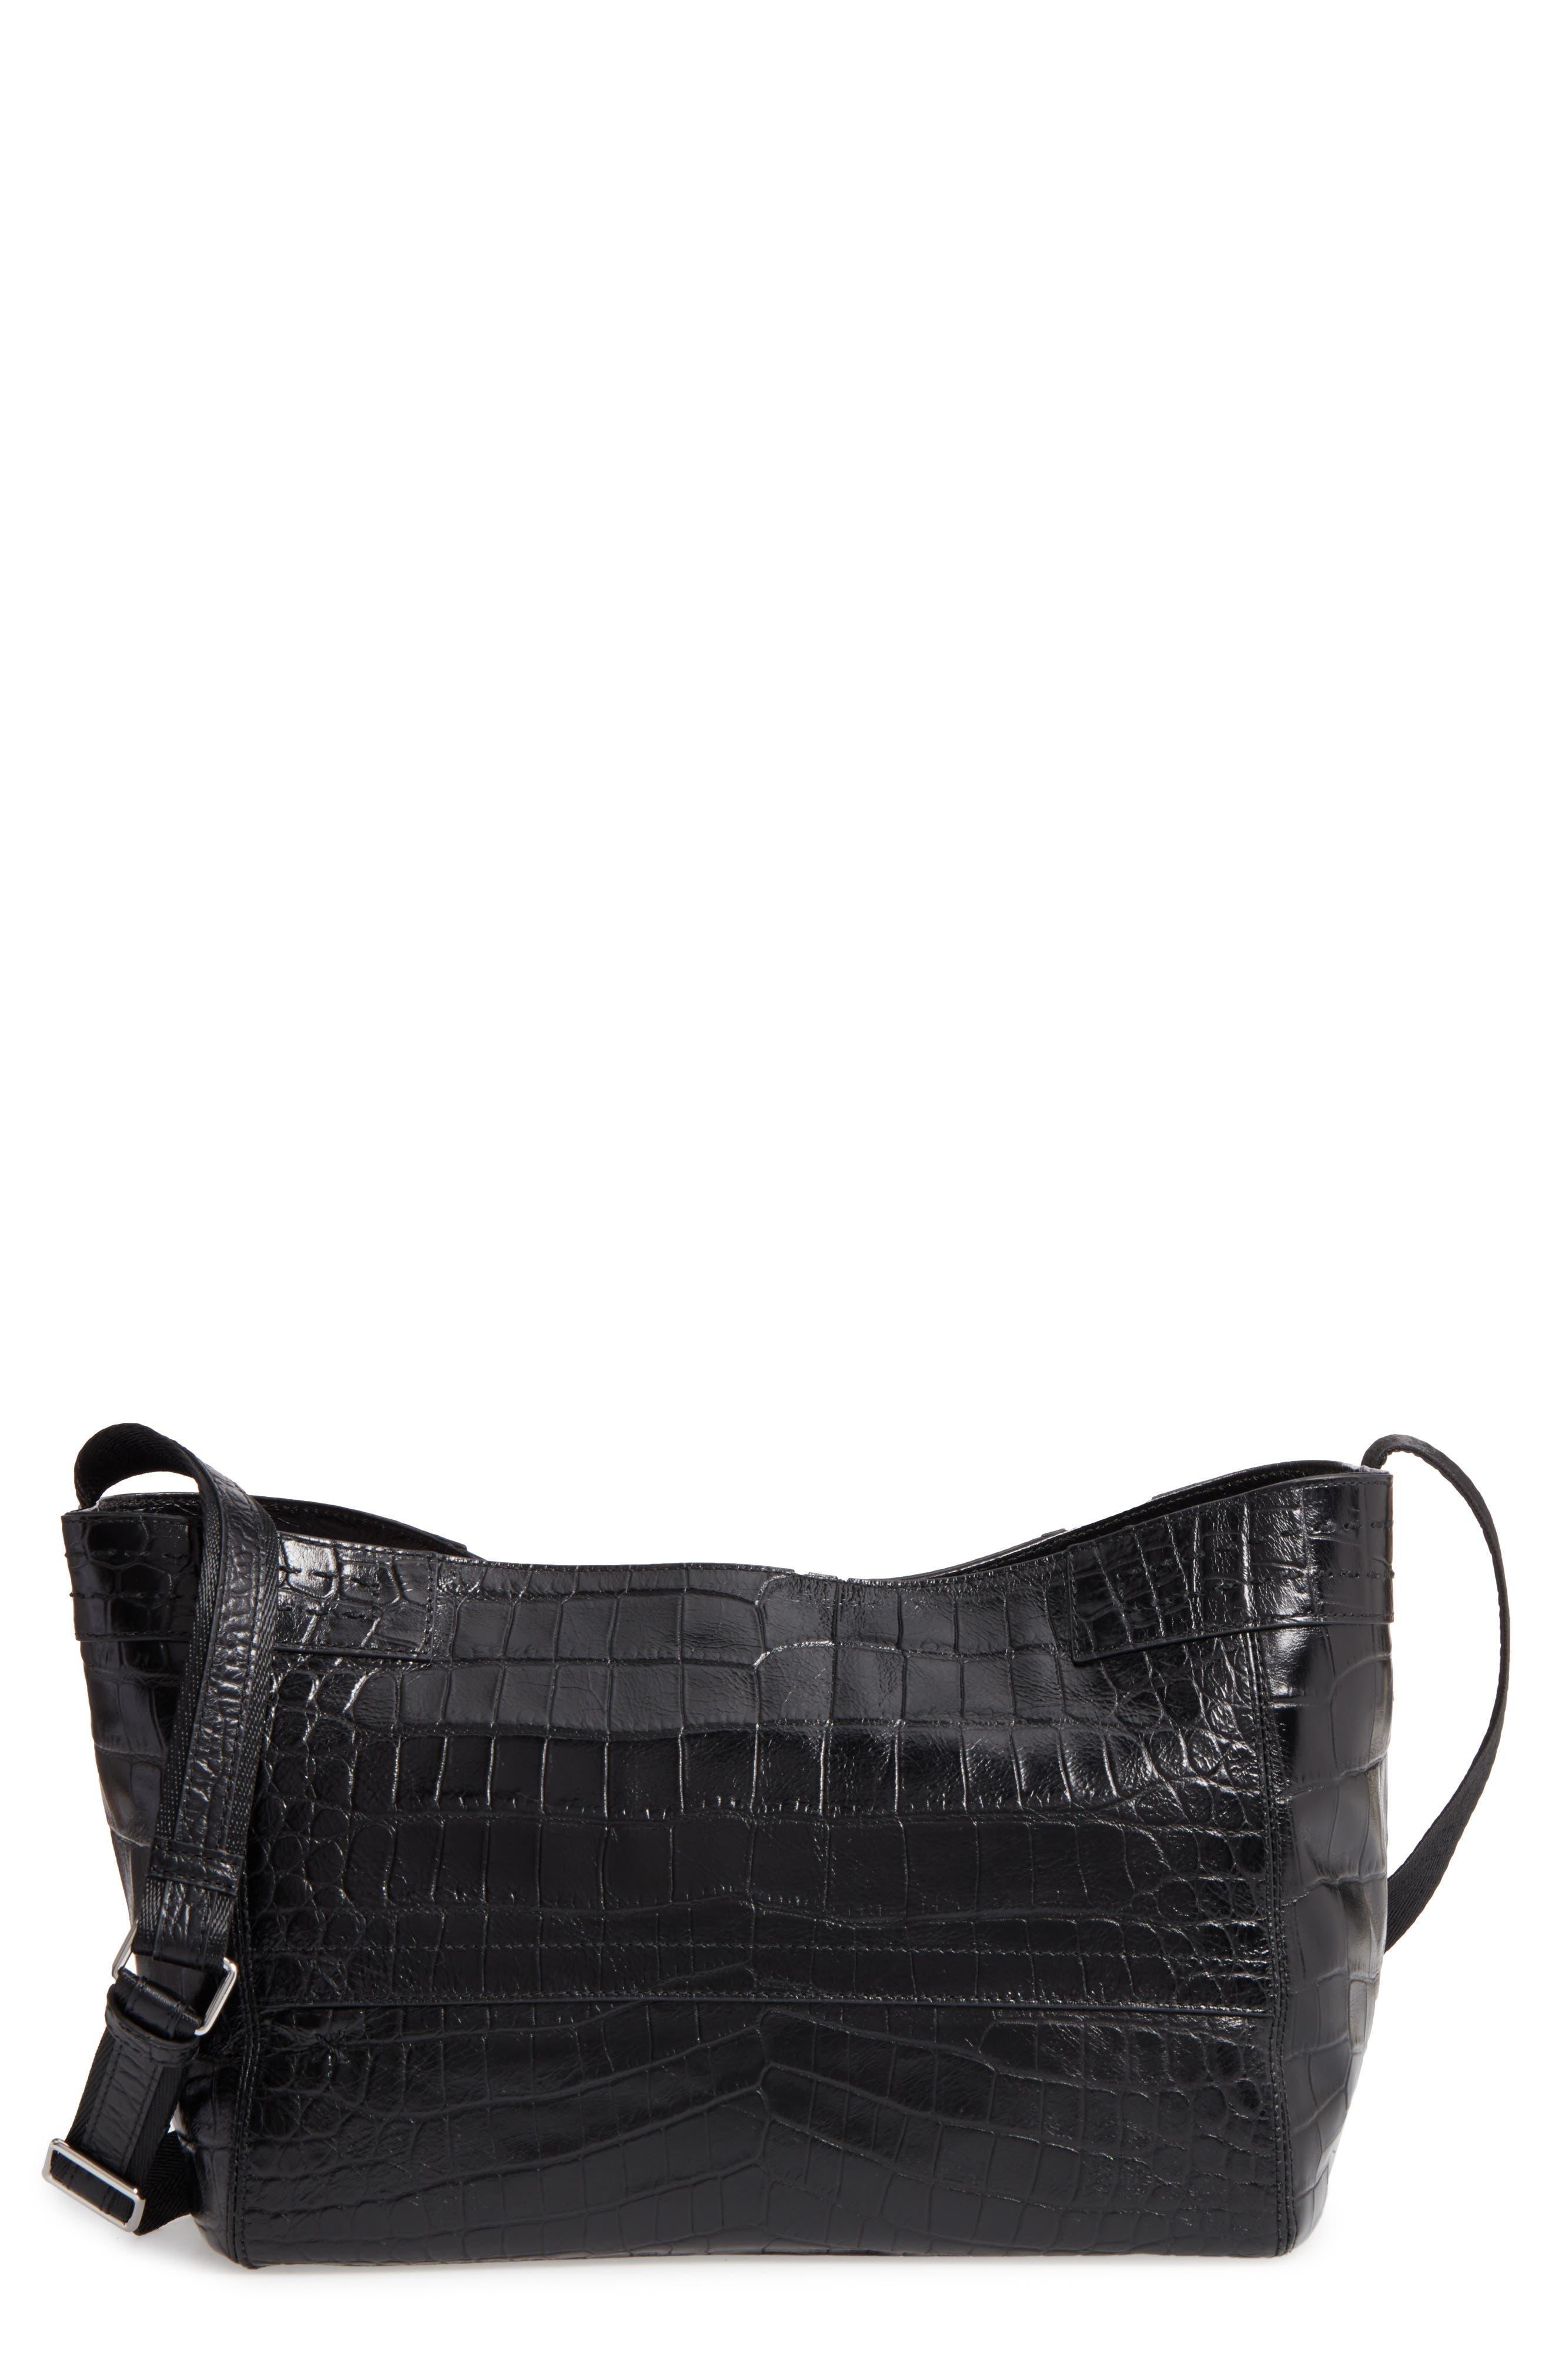 Alternate Image 1 Selected - Elizabeth and James Mini Keely Newspaper Croc Embossed Leather Shoulder/Crossbody Bag